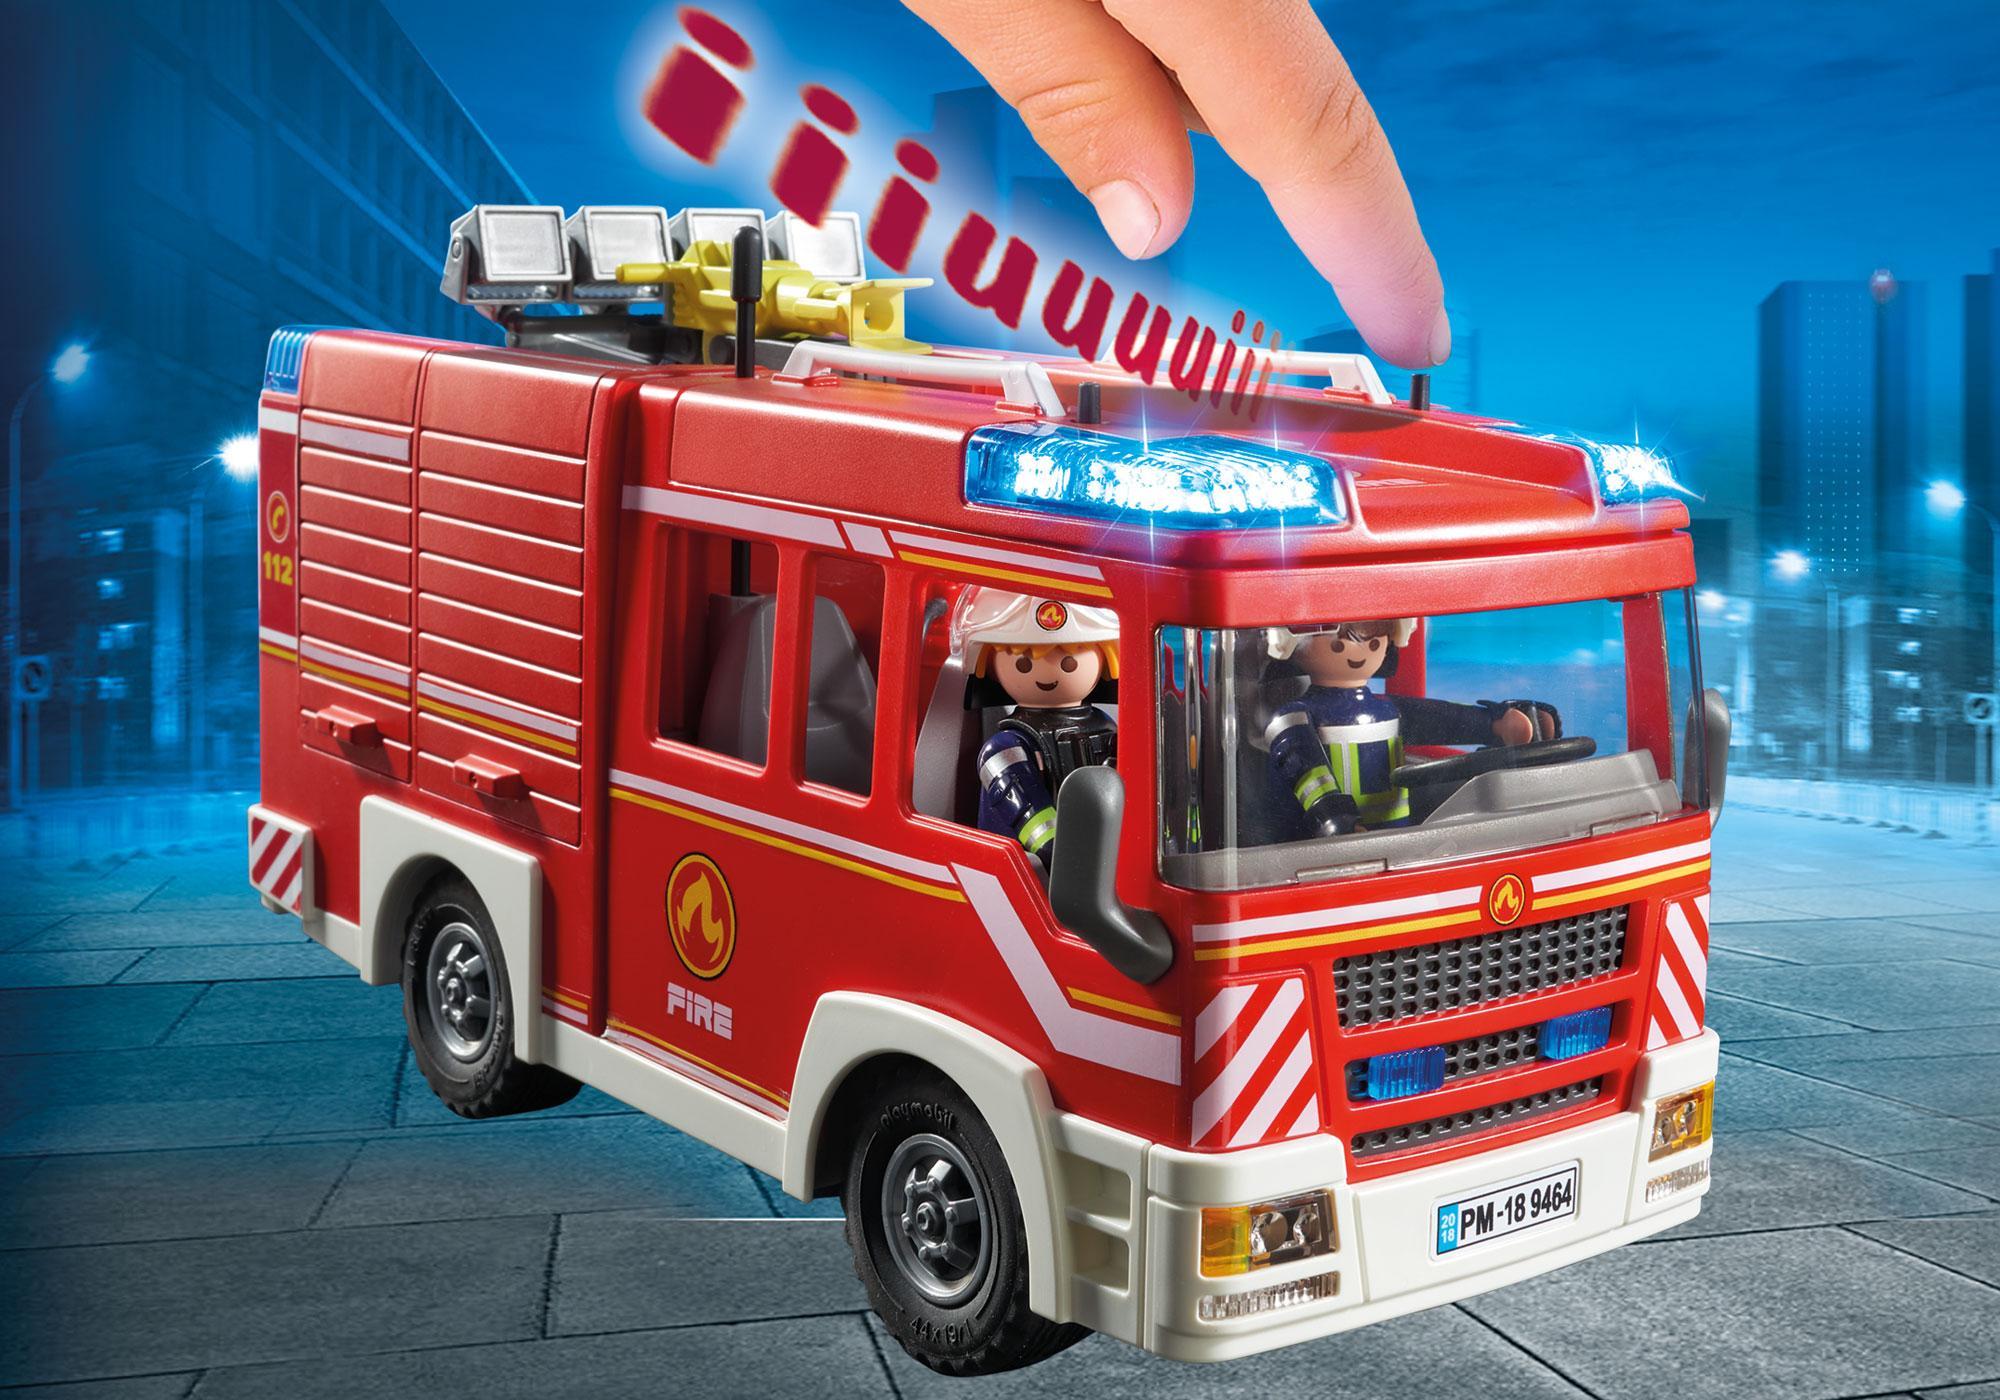 http://media.playmobil.com/i/playmobil/9464_product_extra1/Πυροσβεστικό όχημα